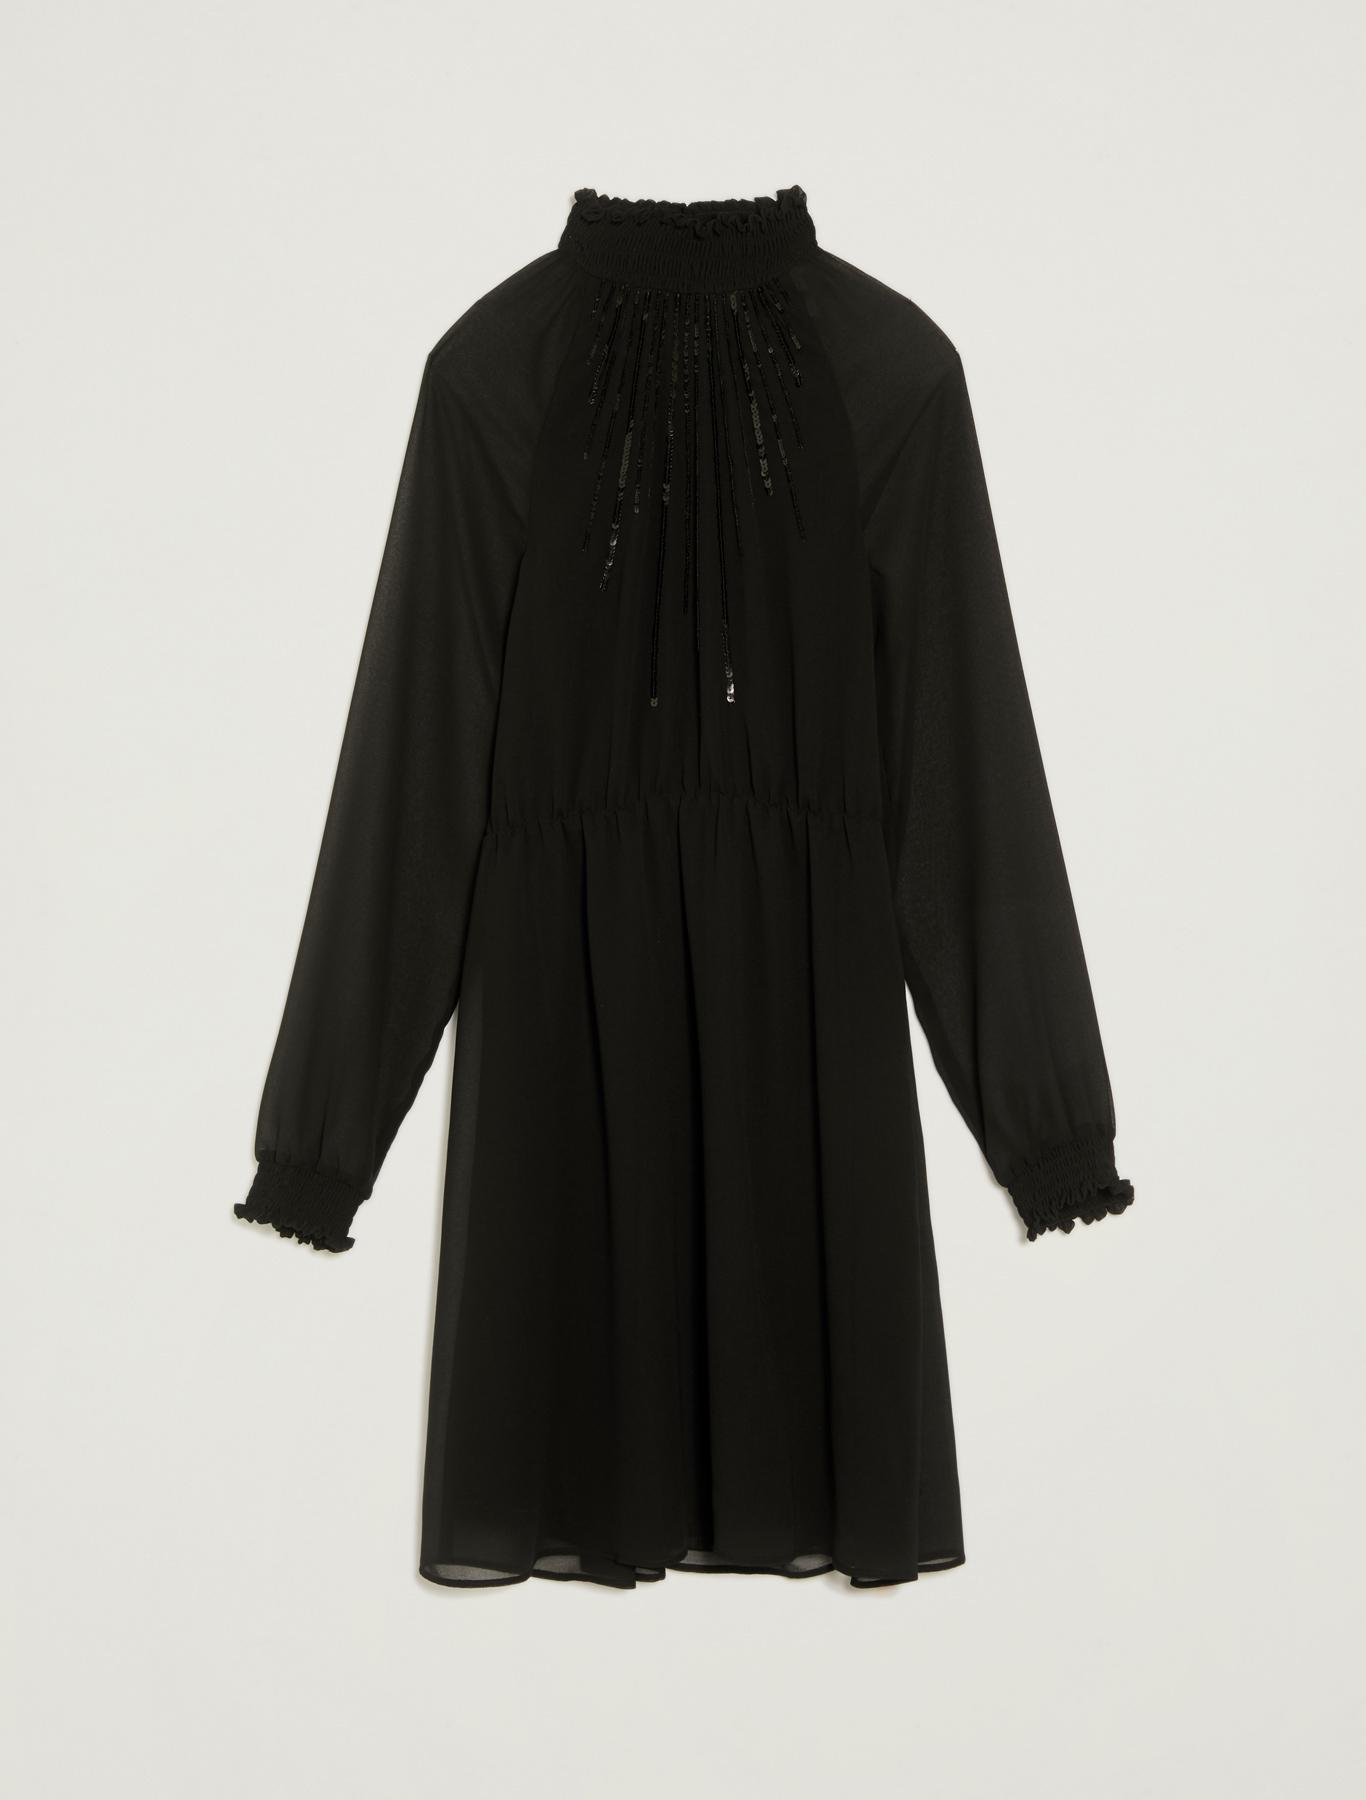 Sequinned georgette dress - black - pennyblack